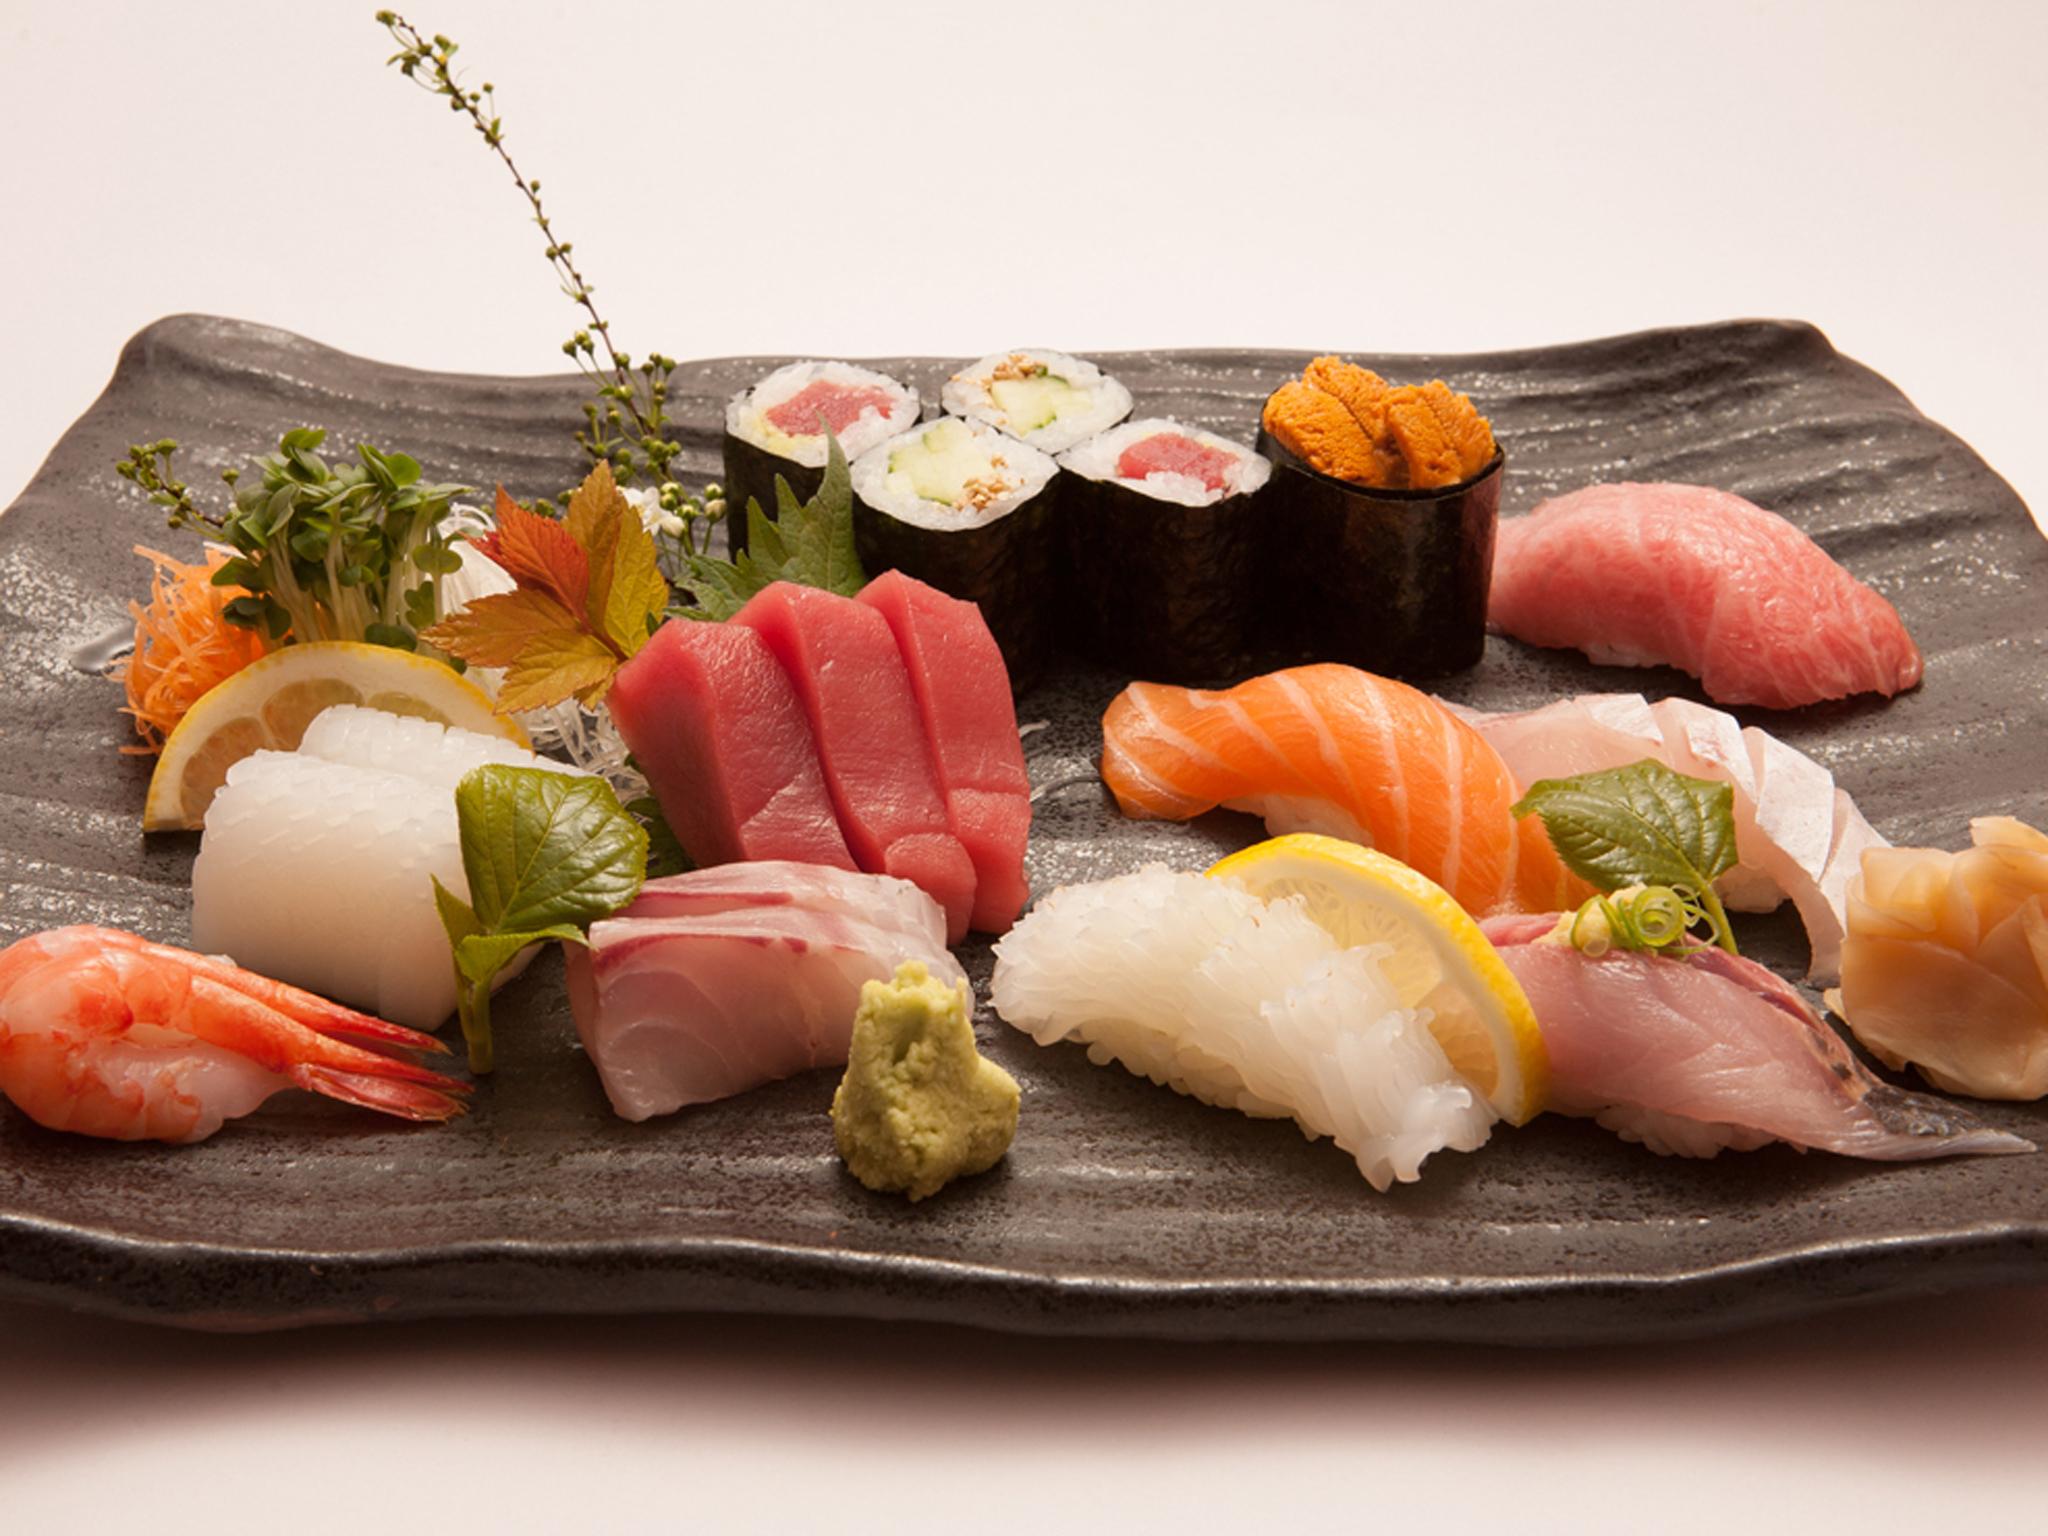 London's best sushi restaurants - Restaurants and cafes ... - photo#36